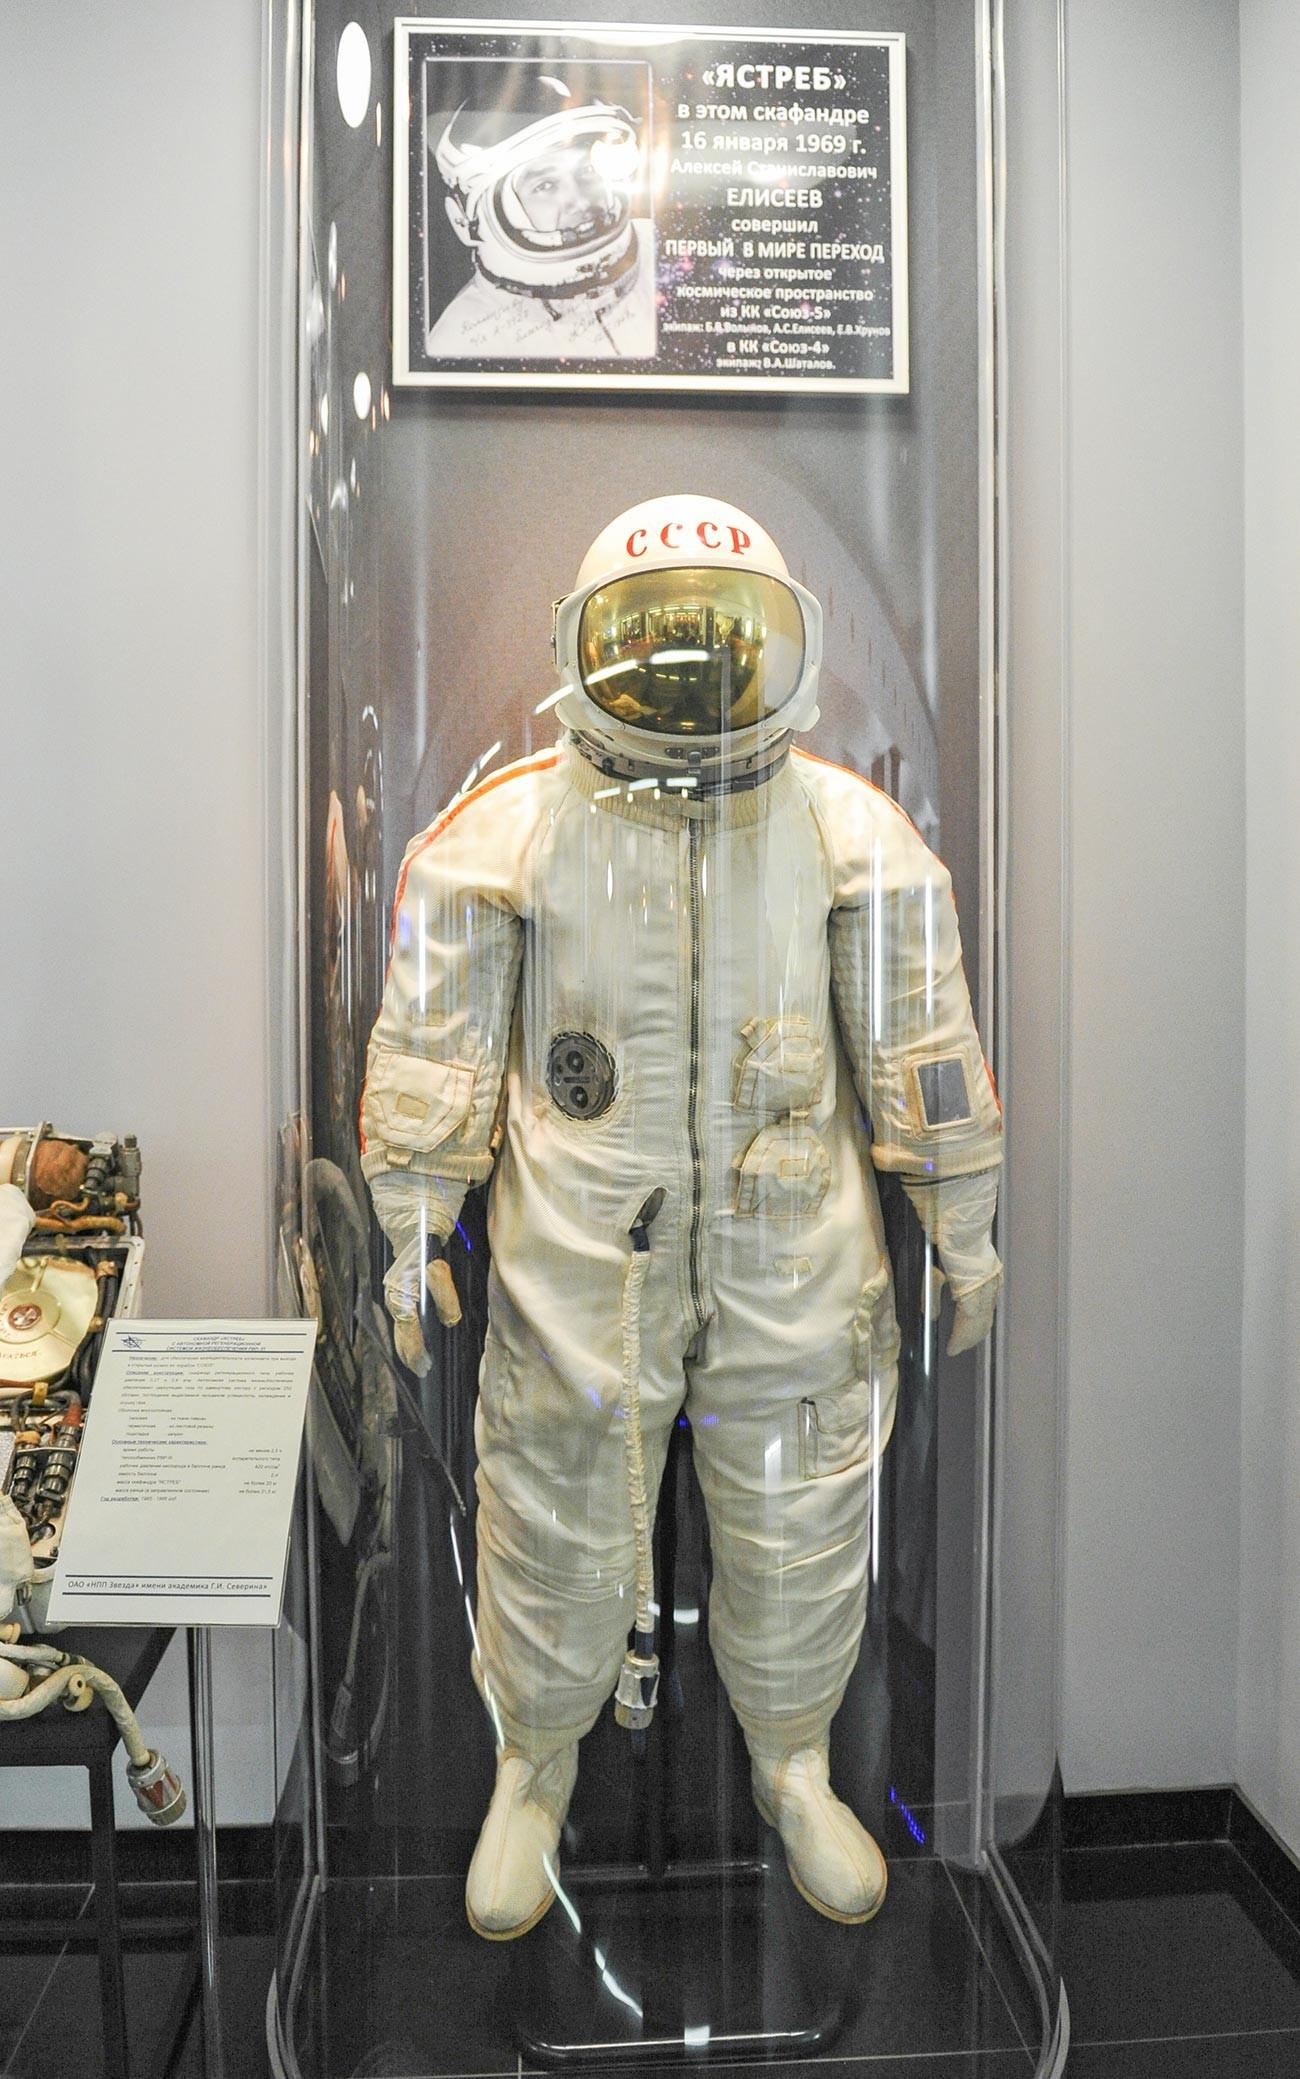 Jastreb-Kosmonautenanzug